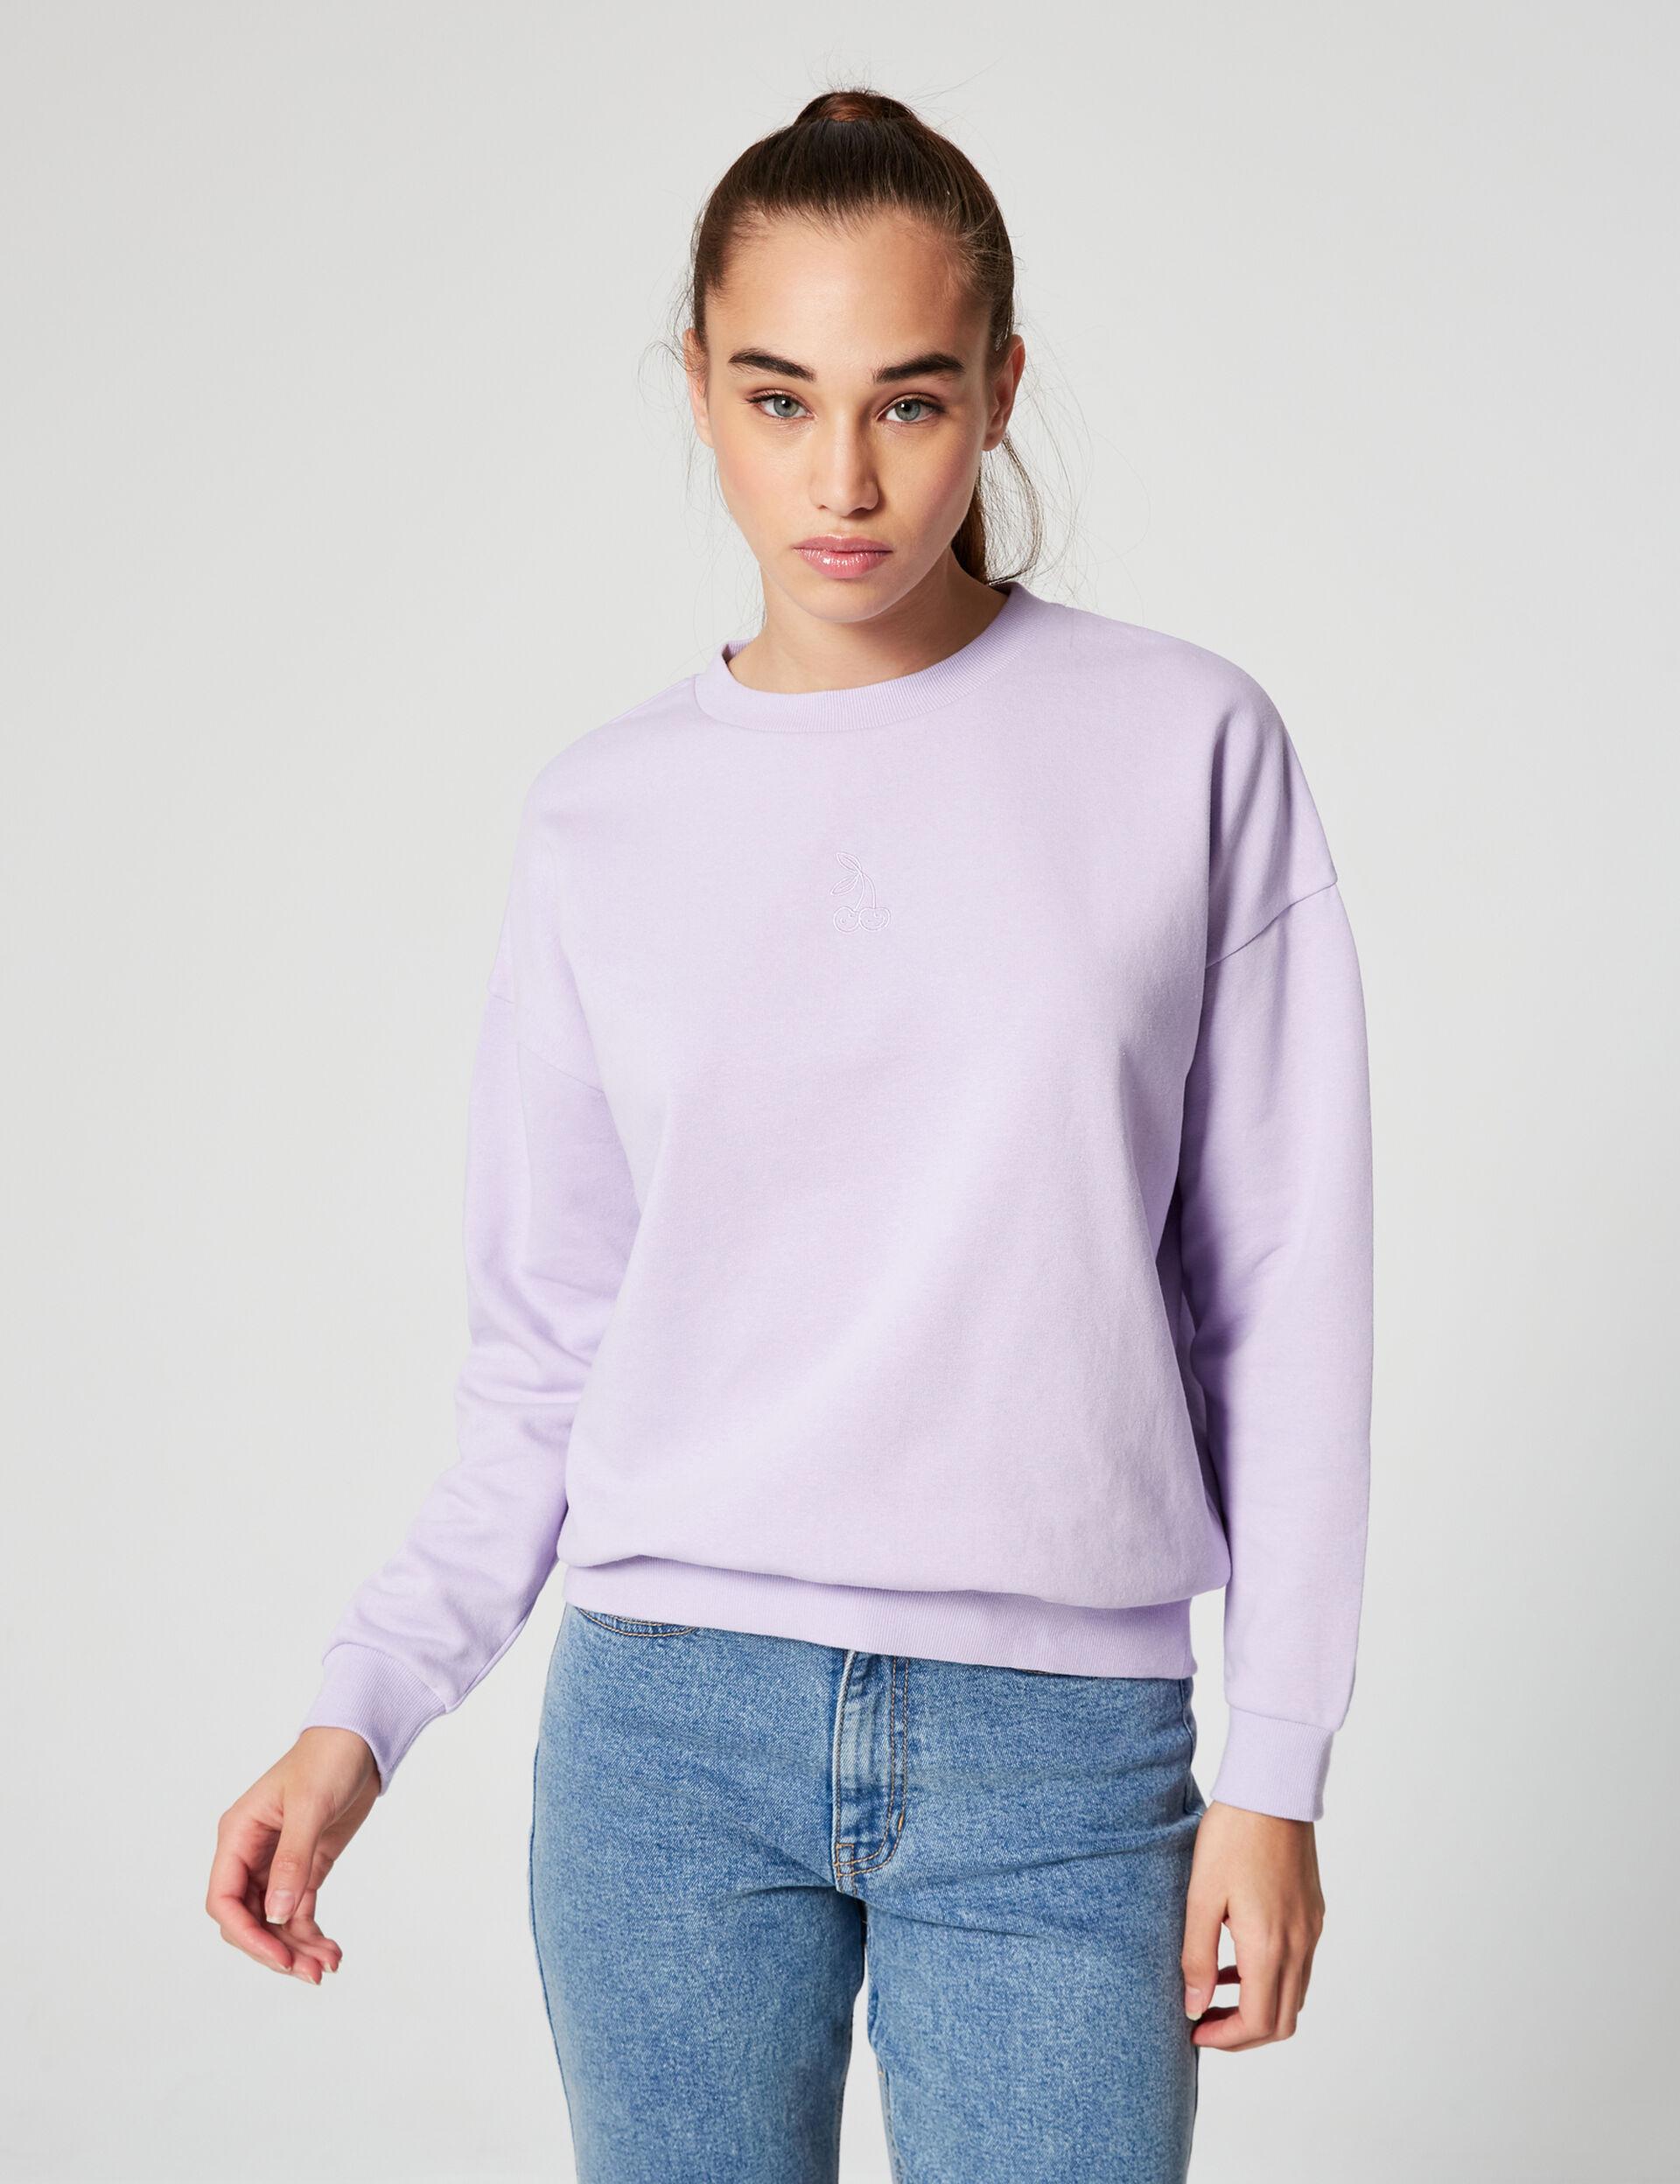 Embroidered cherry sweatshirt